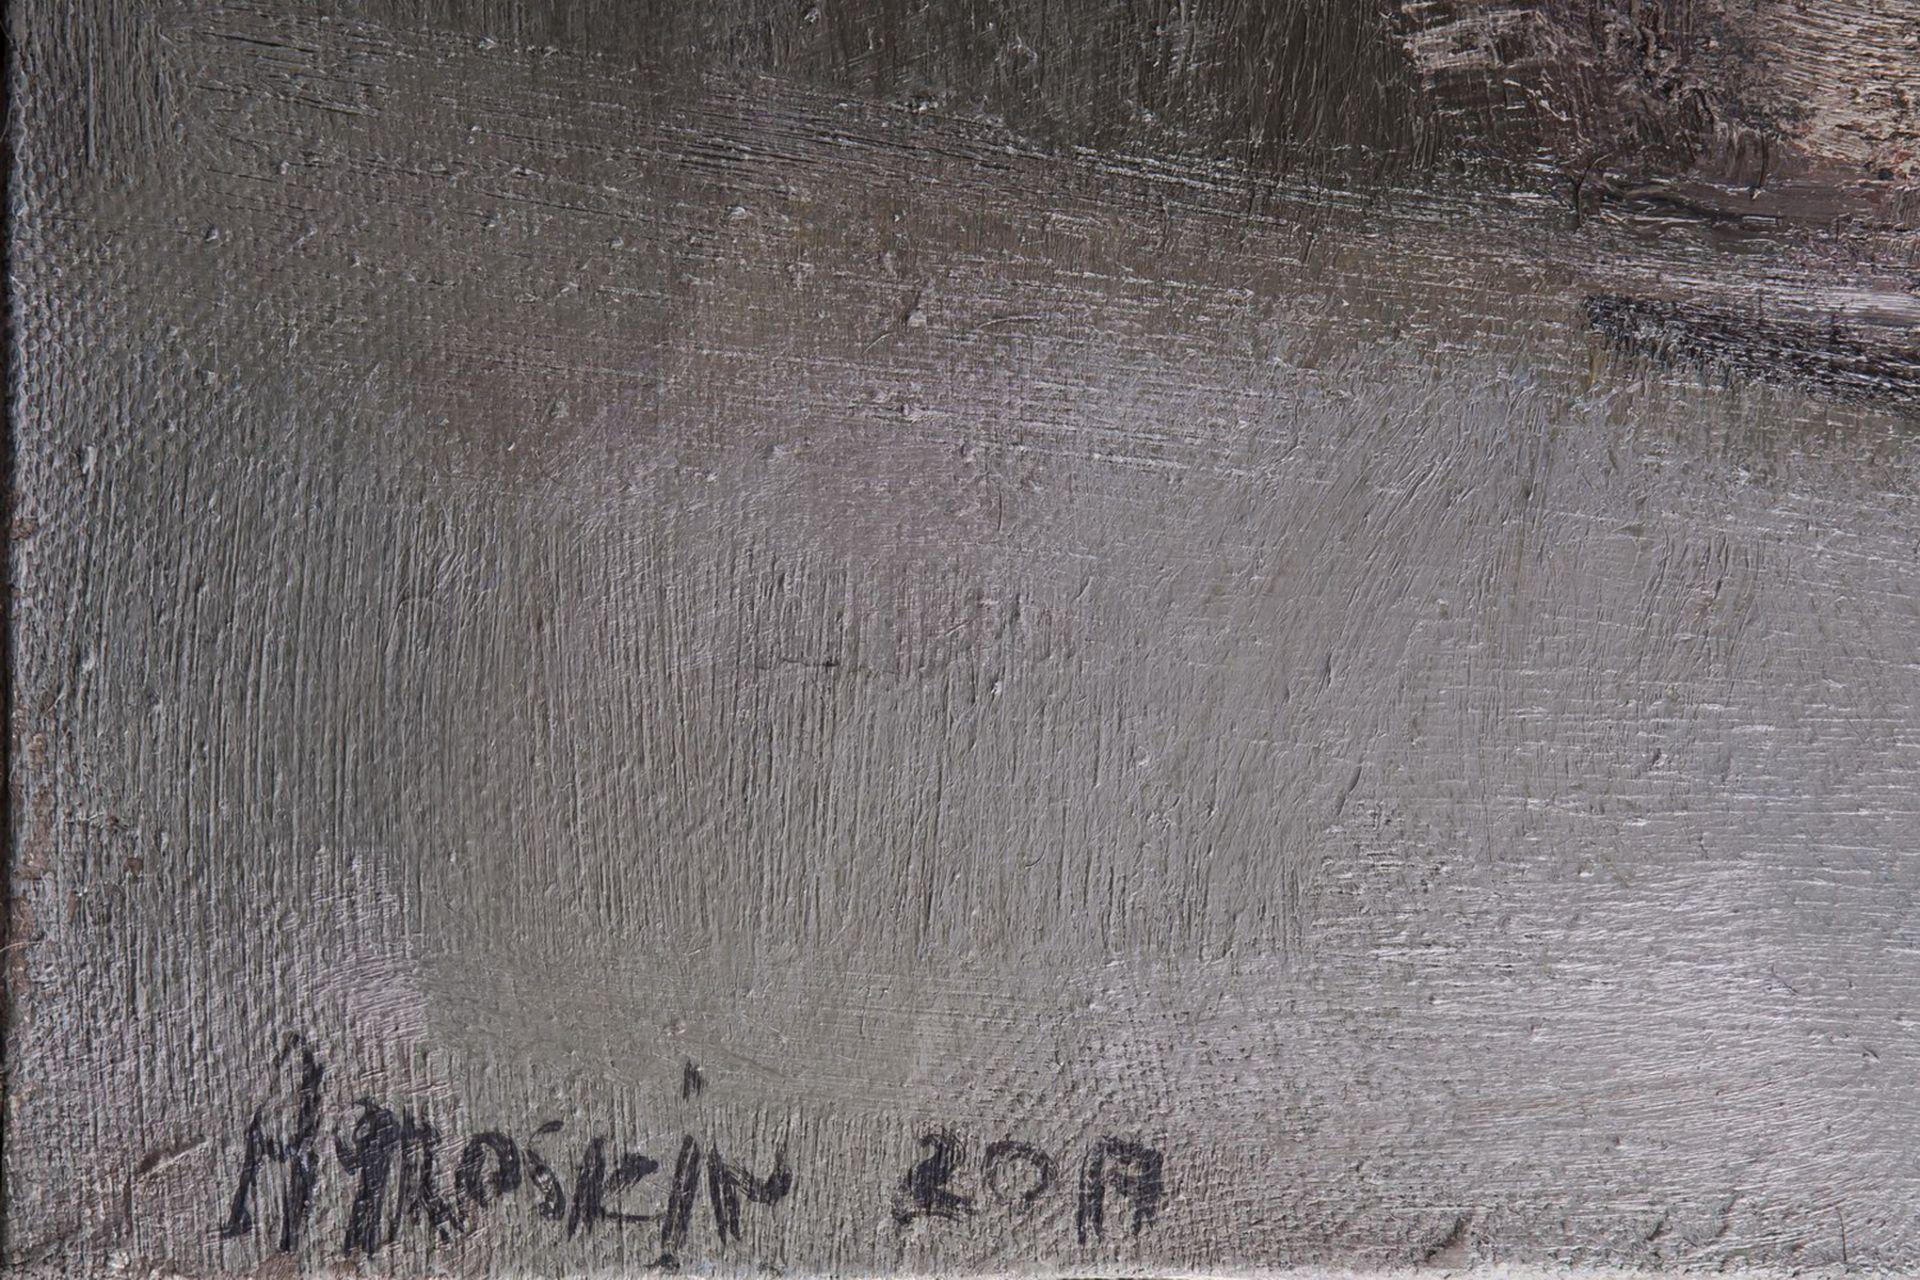 Agroskin, S.E. Buckets. 2017. Oil on canvas. 70x100 cm.<br>Signed. <br>Sales: Lyon &amp; Turnbull (A - Bild 3 aus 3